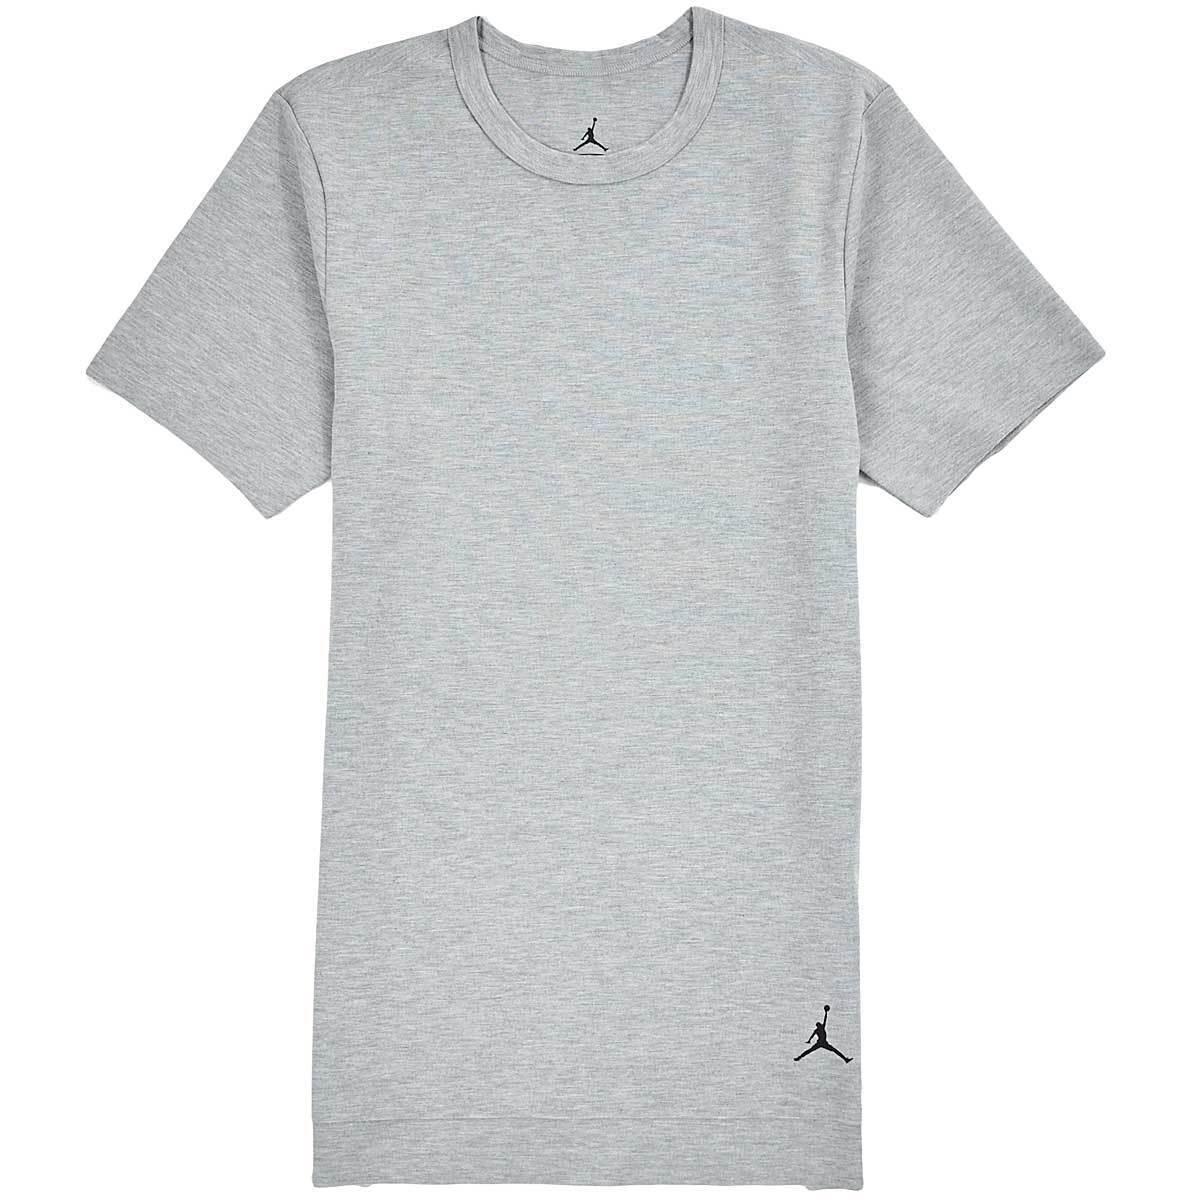 Men's Brand New Jordan Brand Athletic Fashion Design Plain T-Shirt [724496 064]